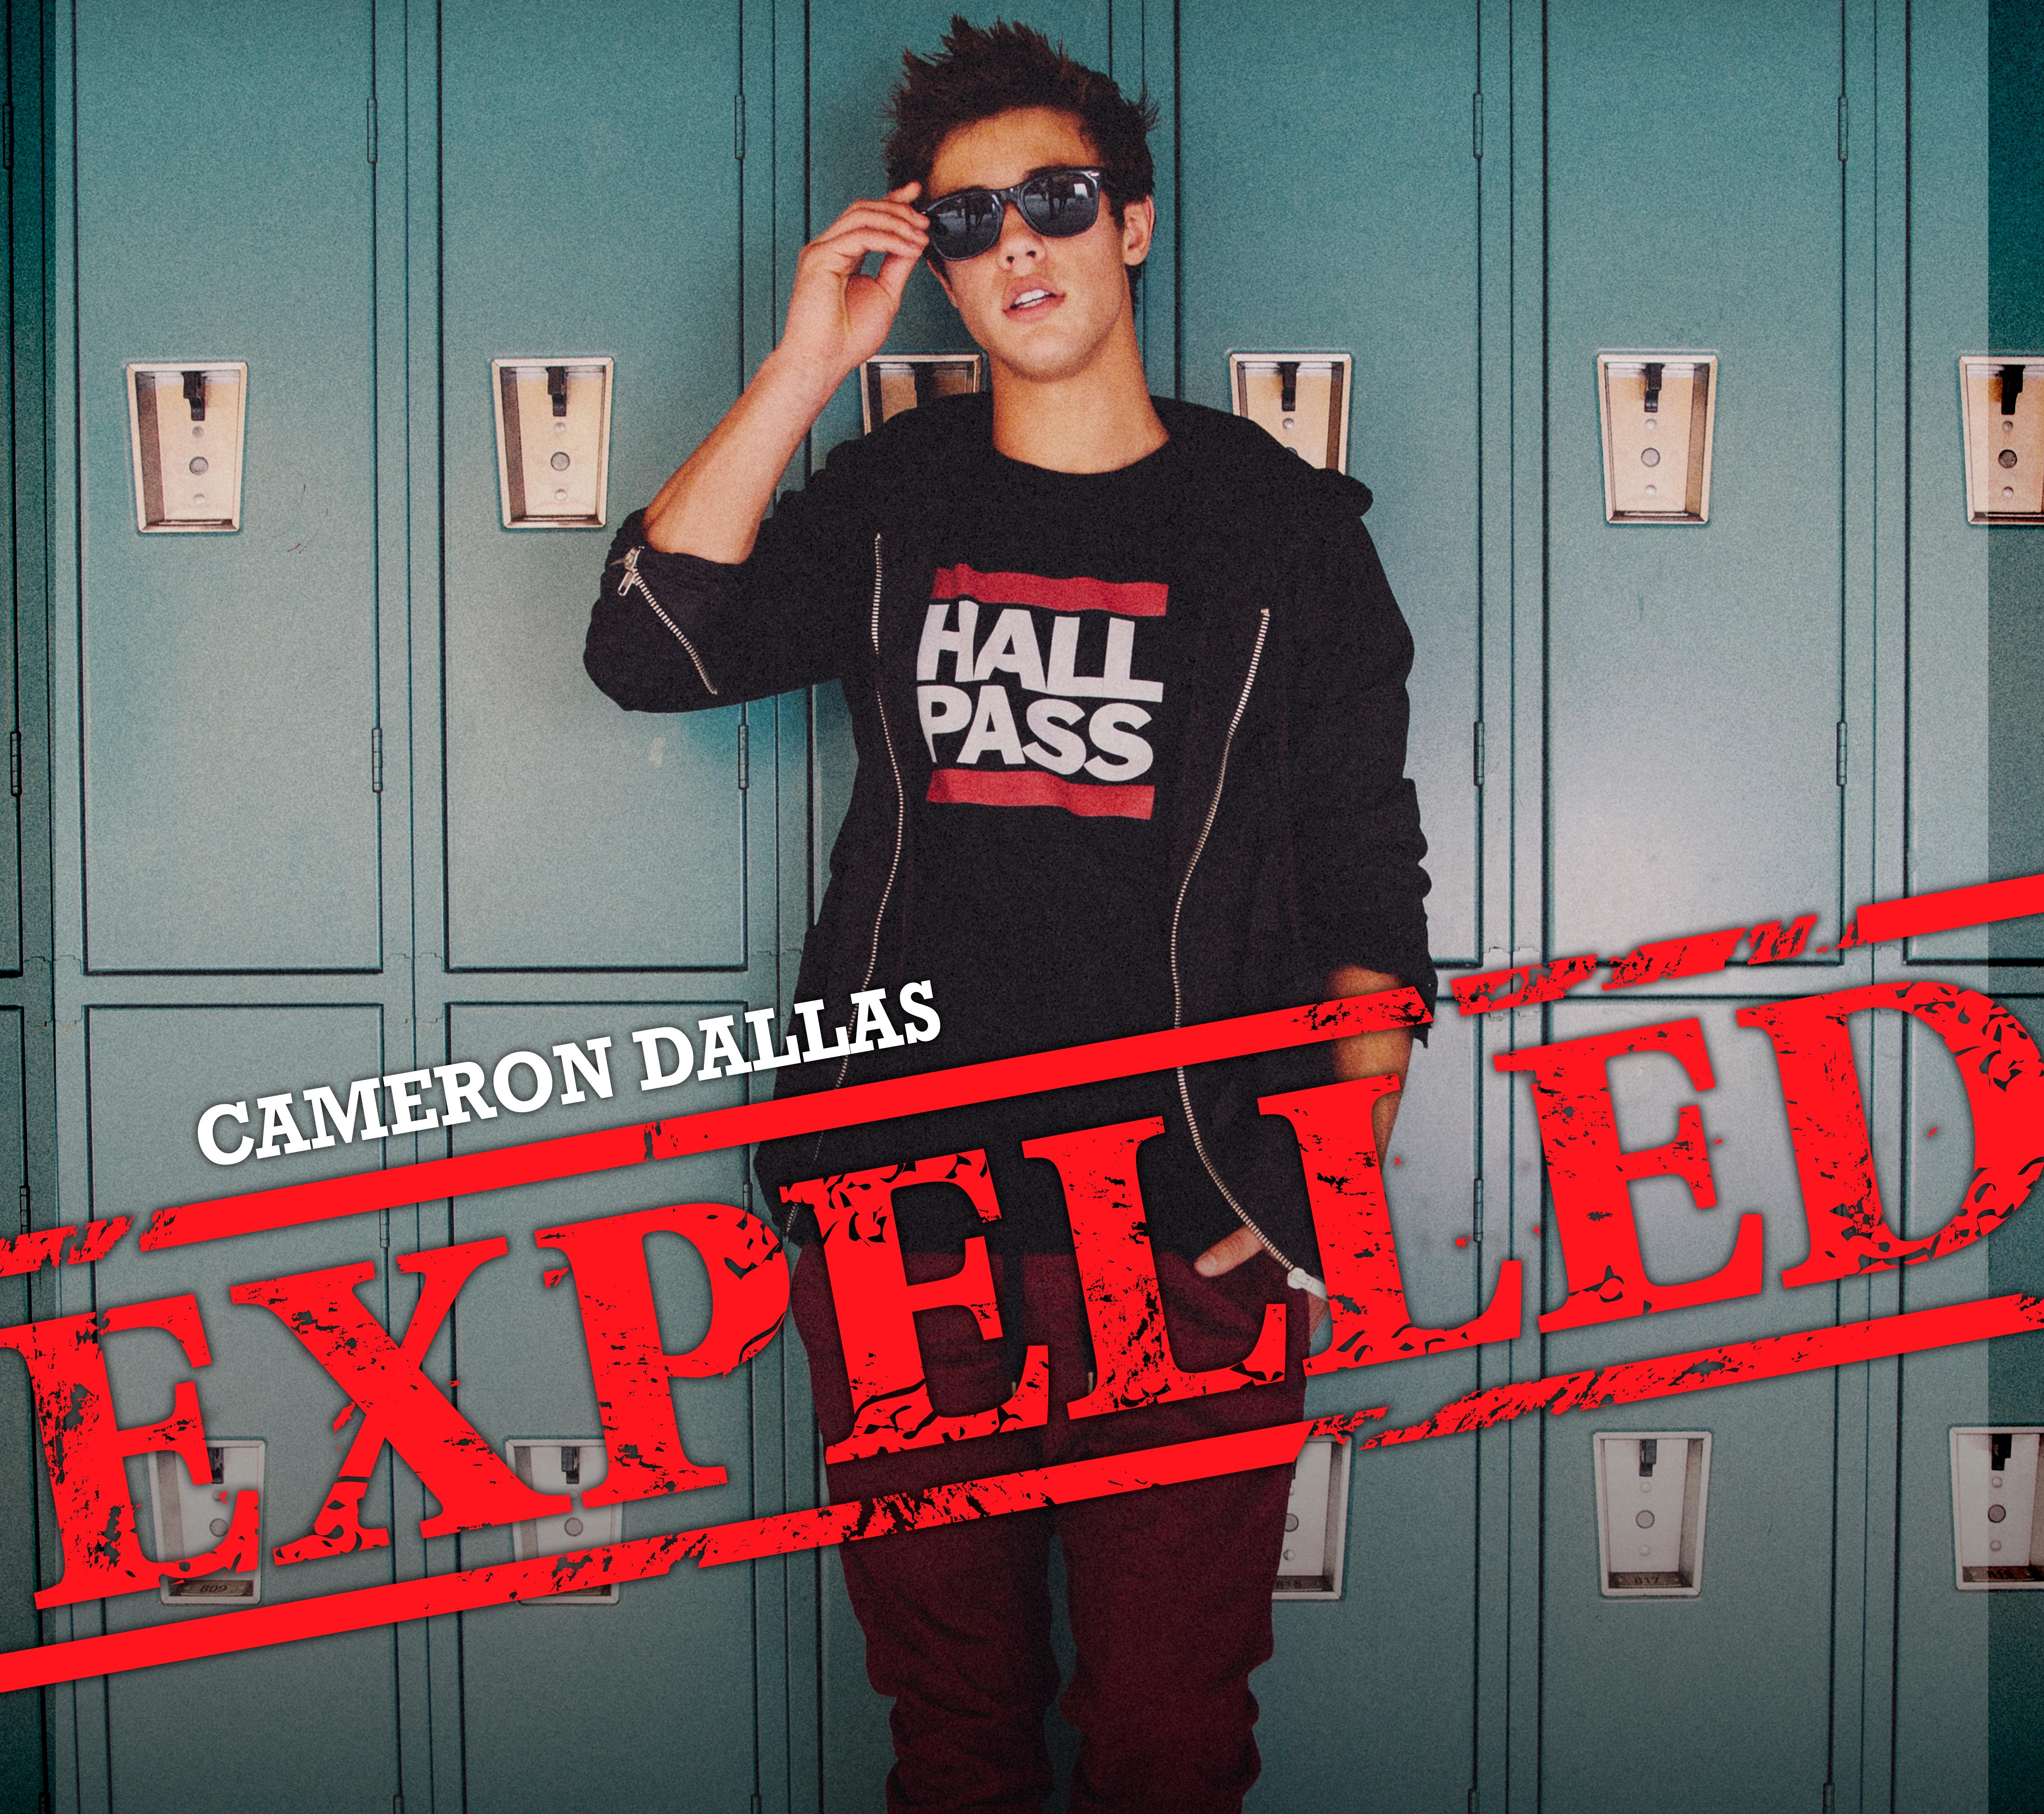 cameron-dallas-expelled.jpg